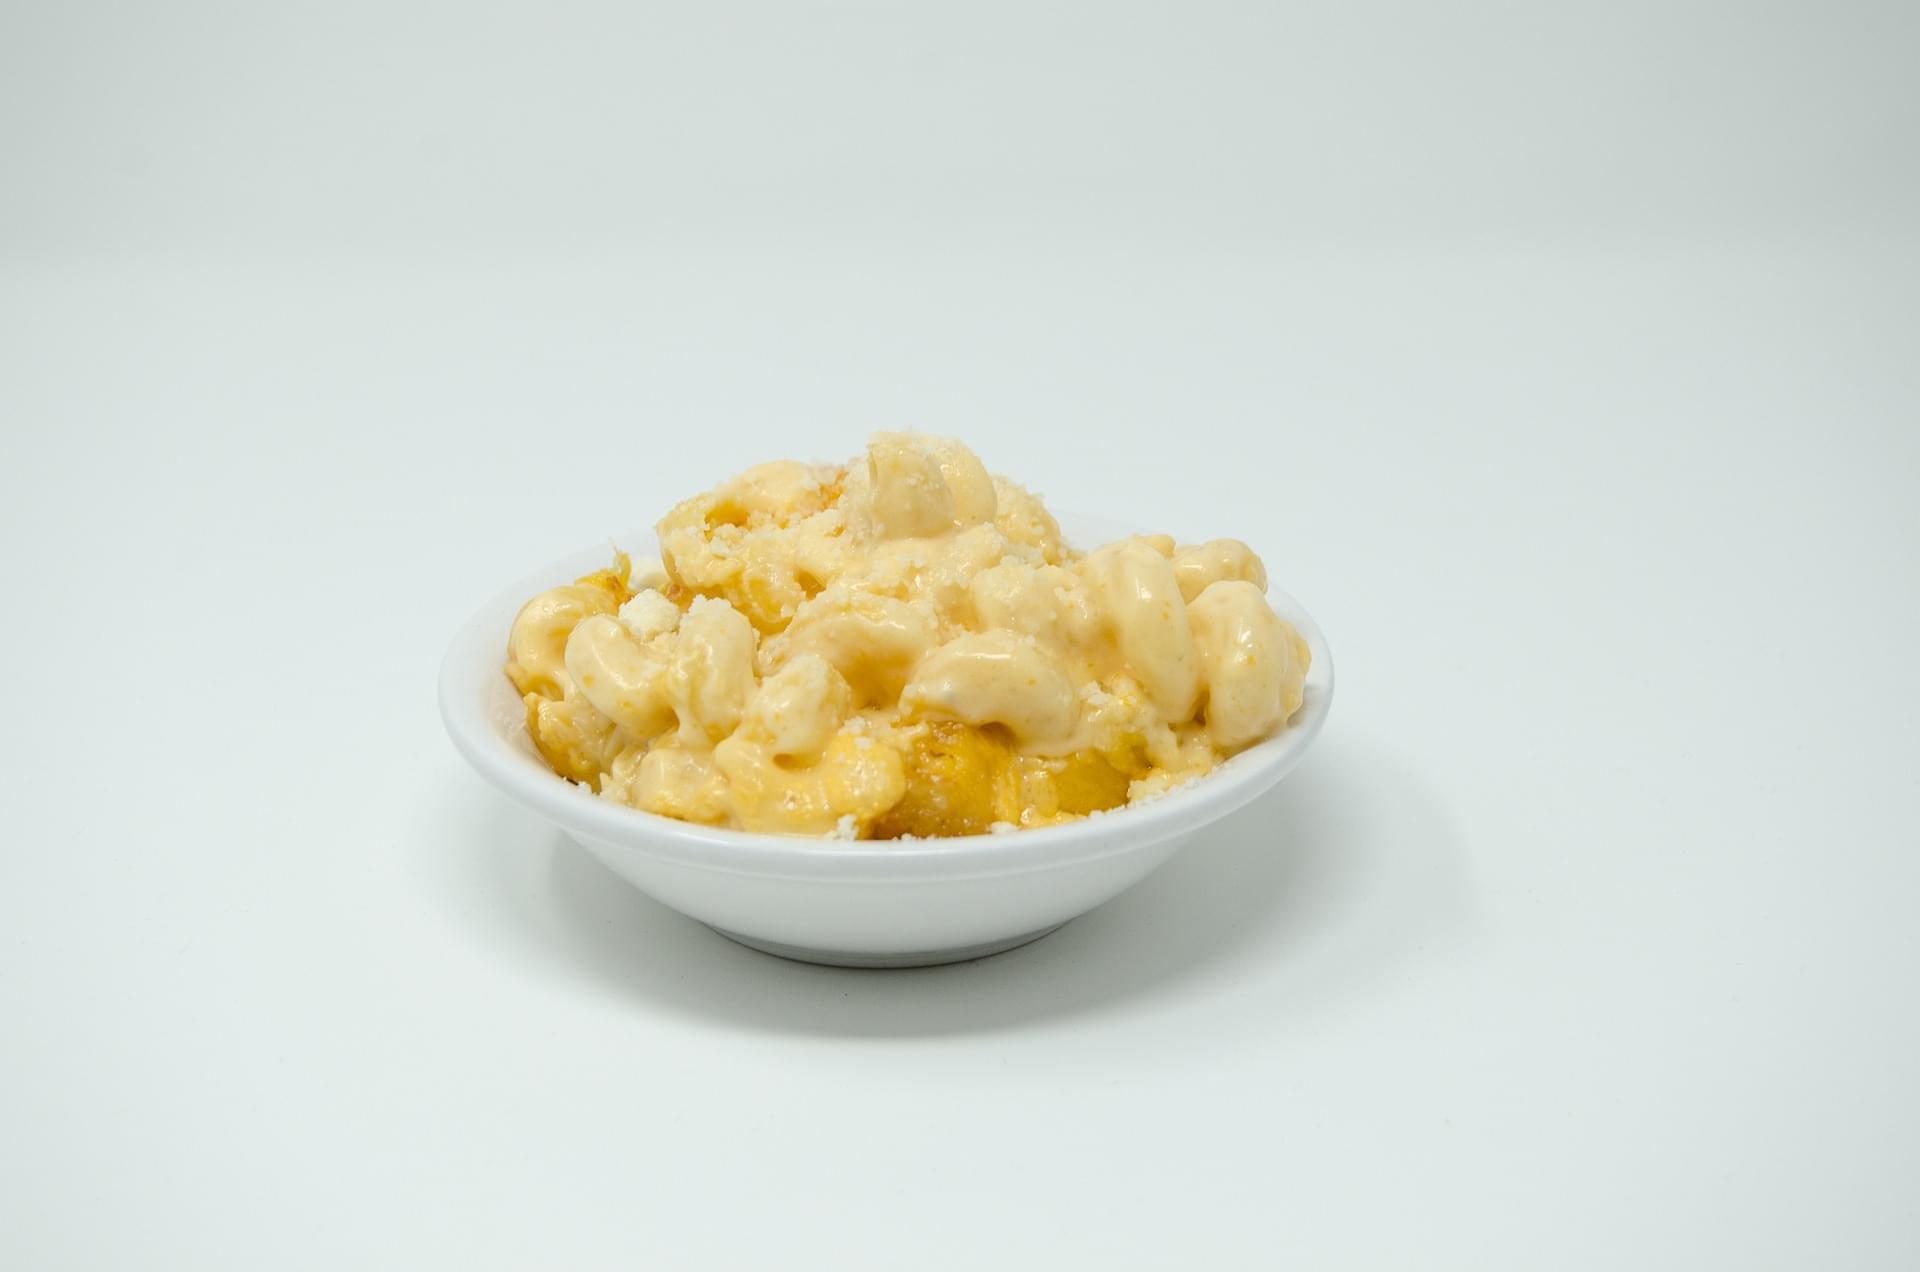 macaroni-and-cheese-5347210_1920